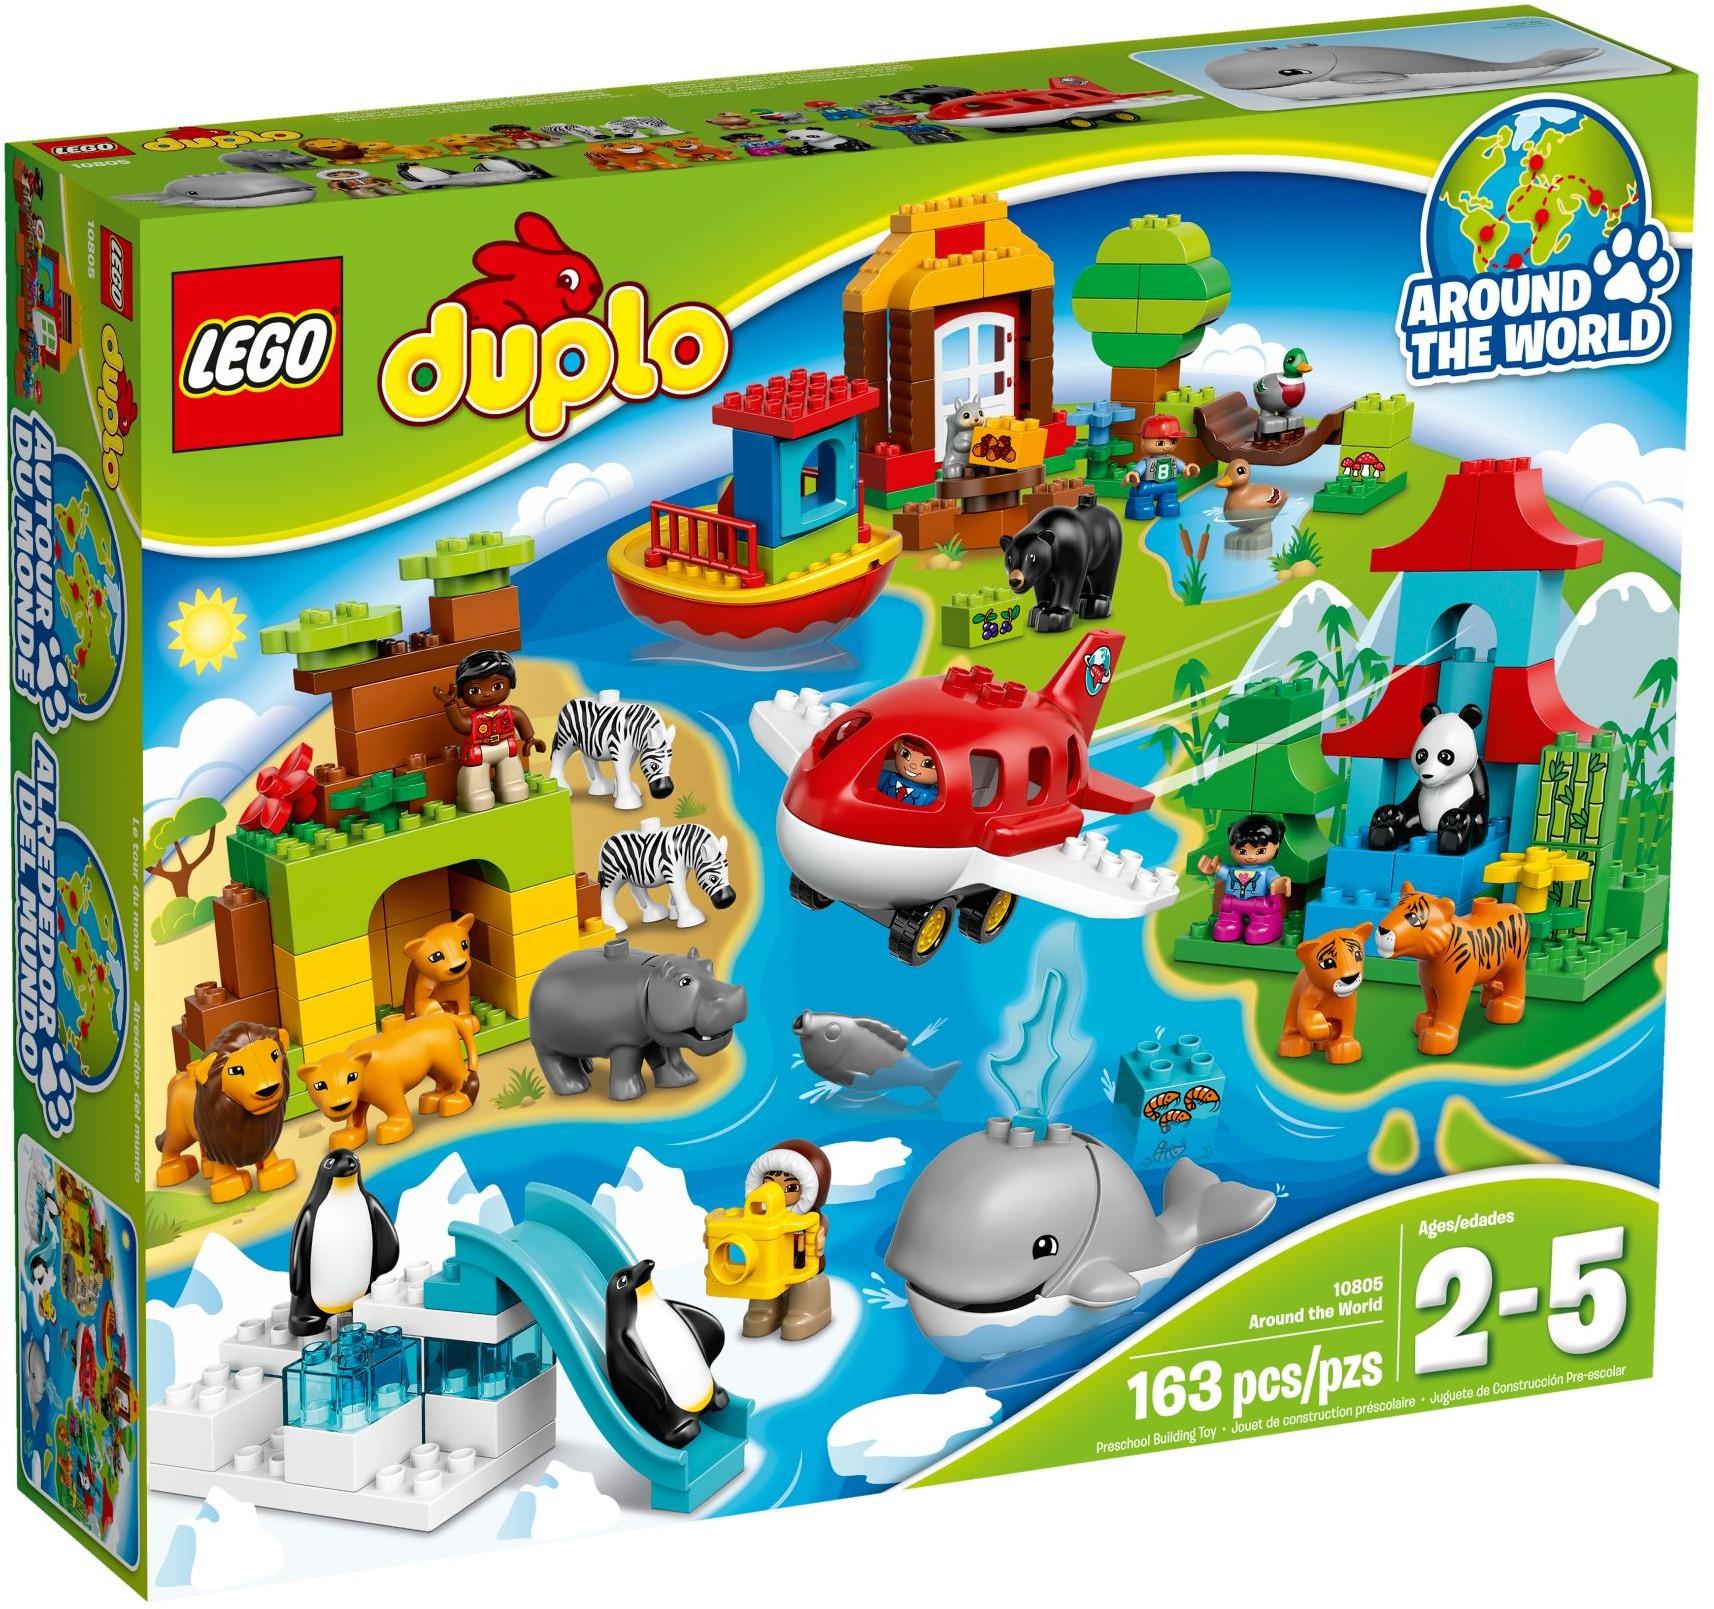 LEGO # 10805 DUPLO Around the World